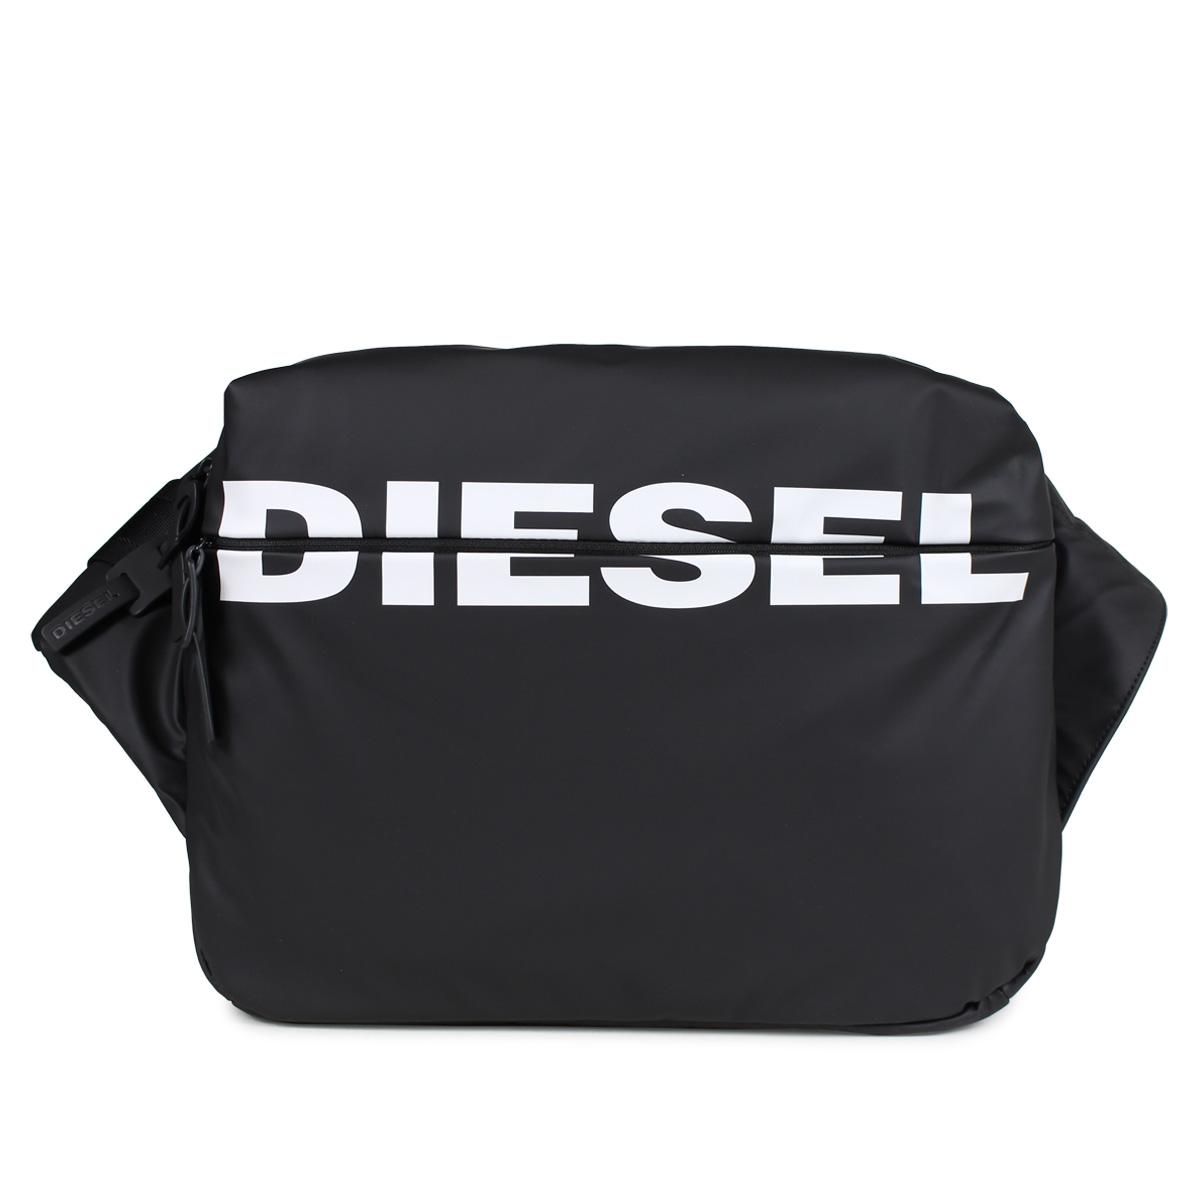 DIESEL F-BOLD CROSS ディーゼル バッグ ボディバッグ メンズ ブラック 黒 X05476 P1705